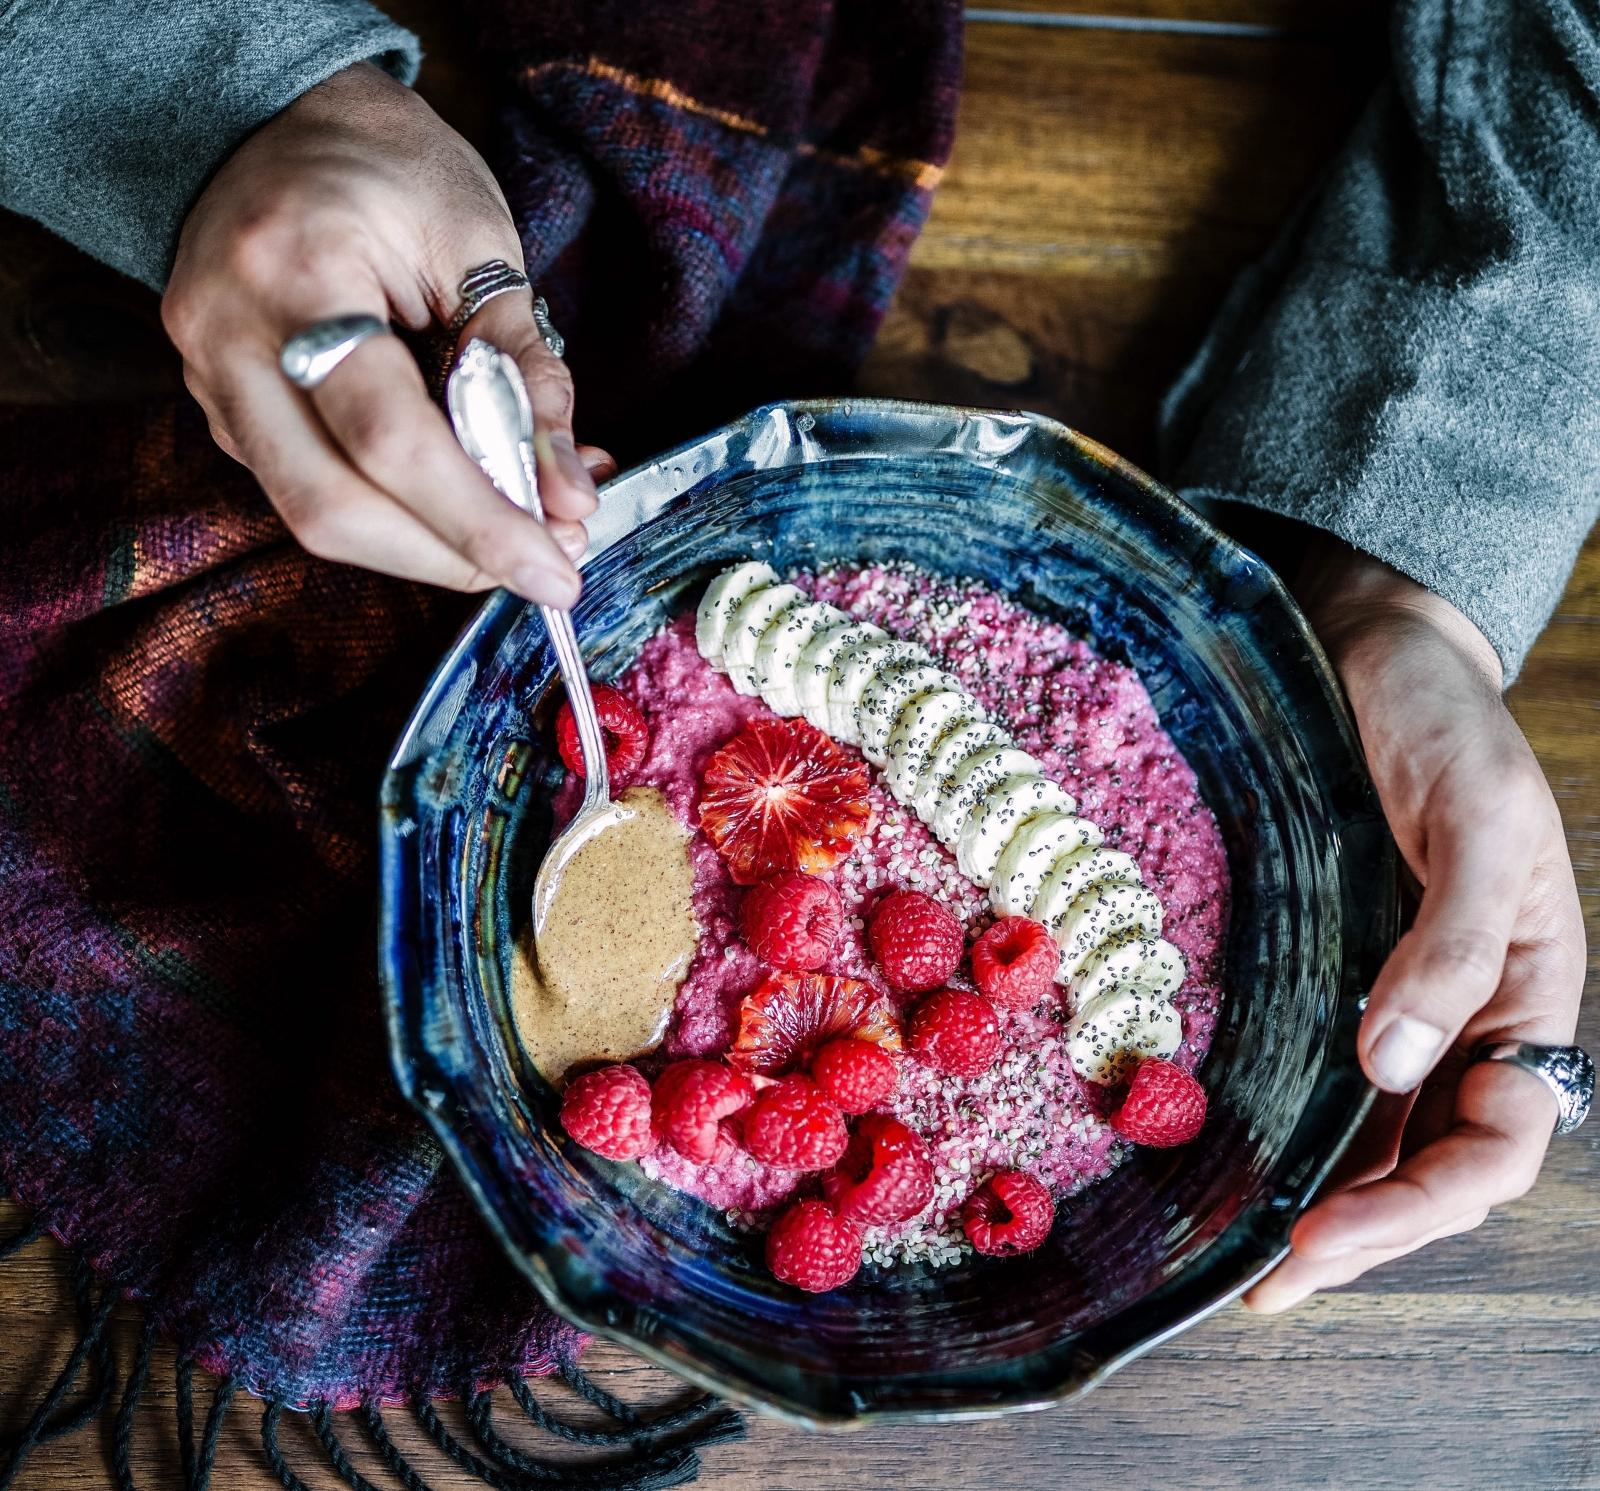 Pink porridge with bananas and raspberries